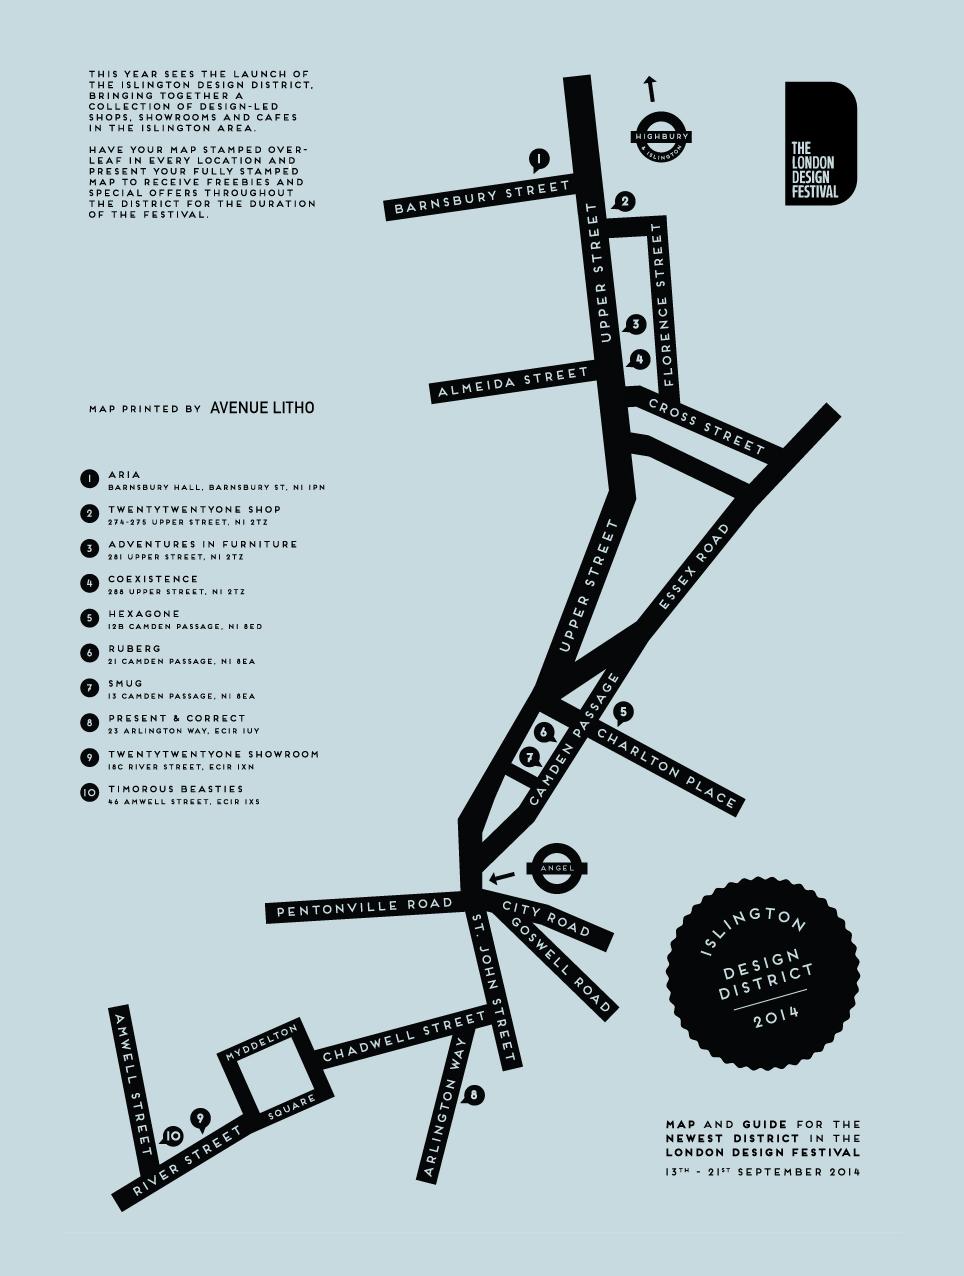 Islington Design District -